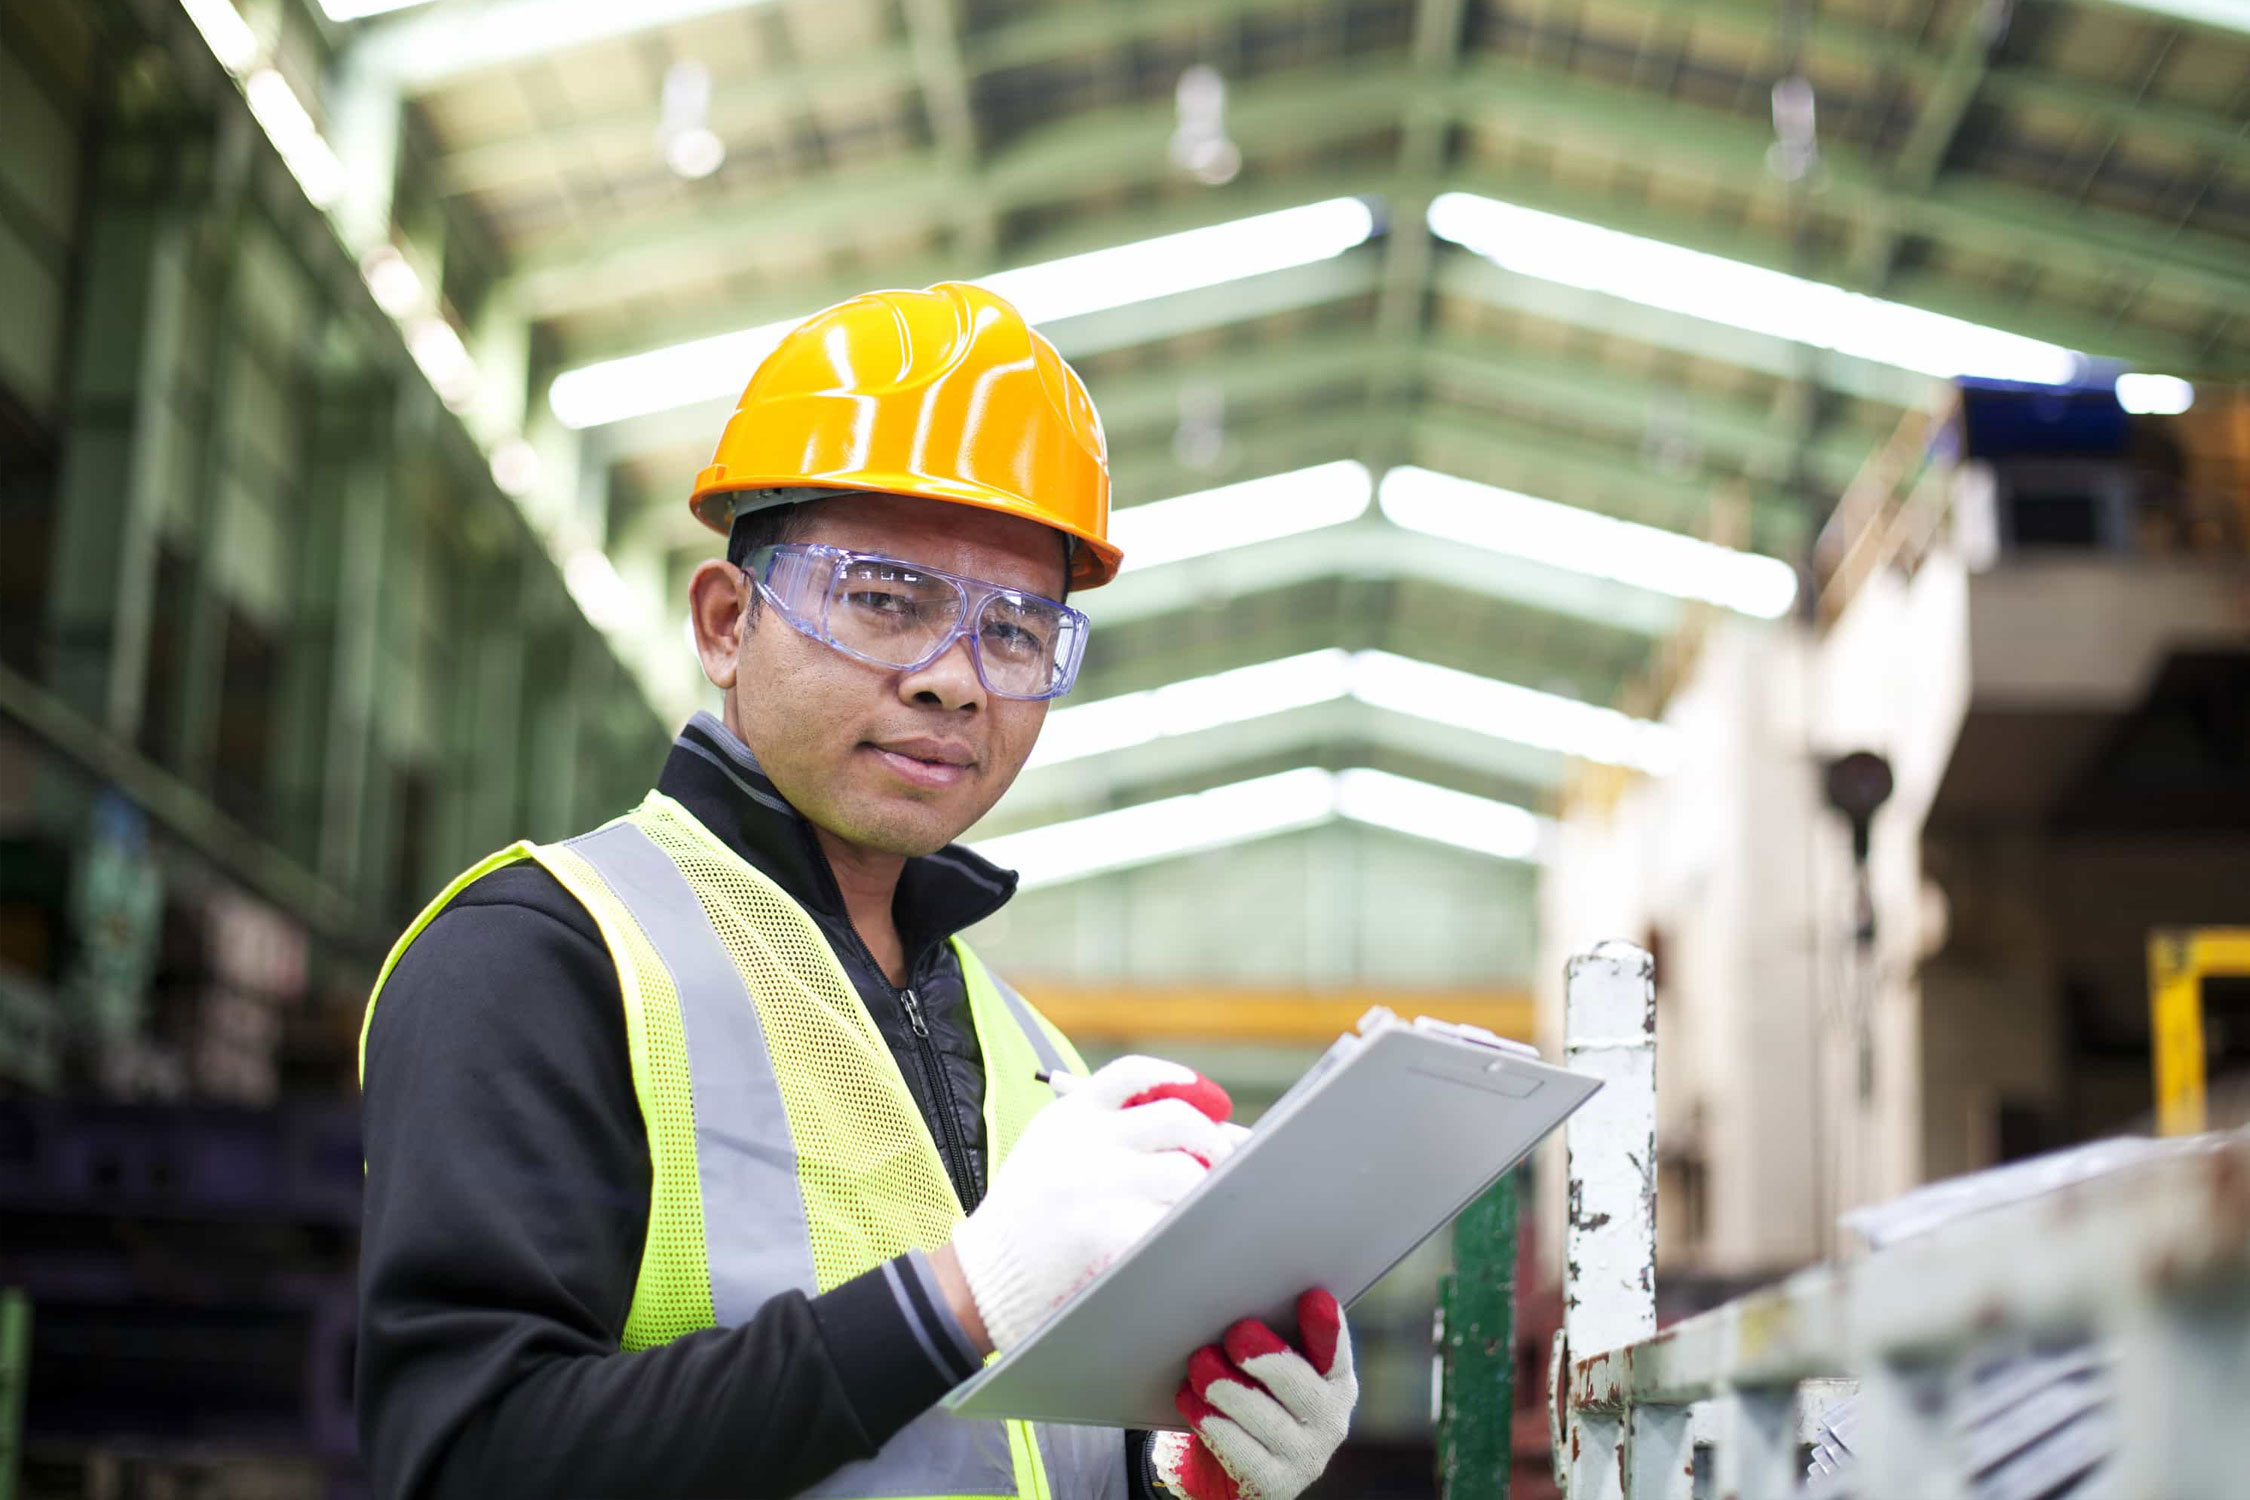 Con controles de calidad conservas clientes e inversionistas